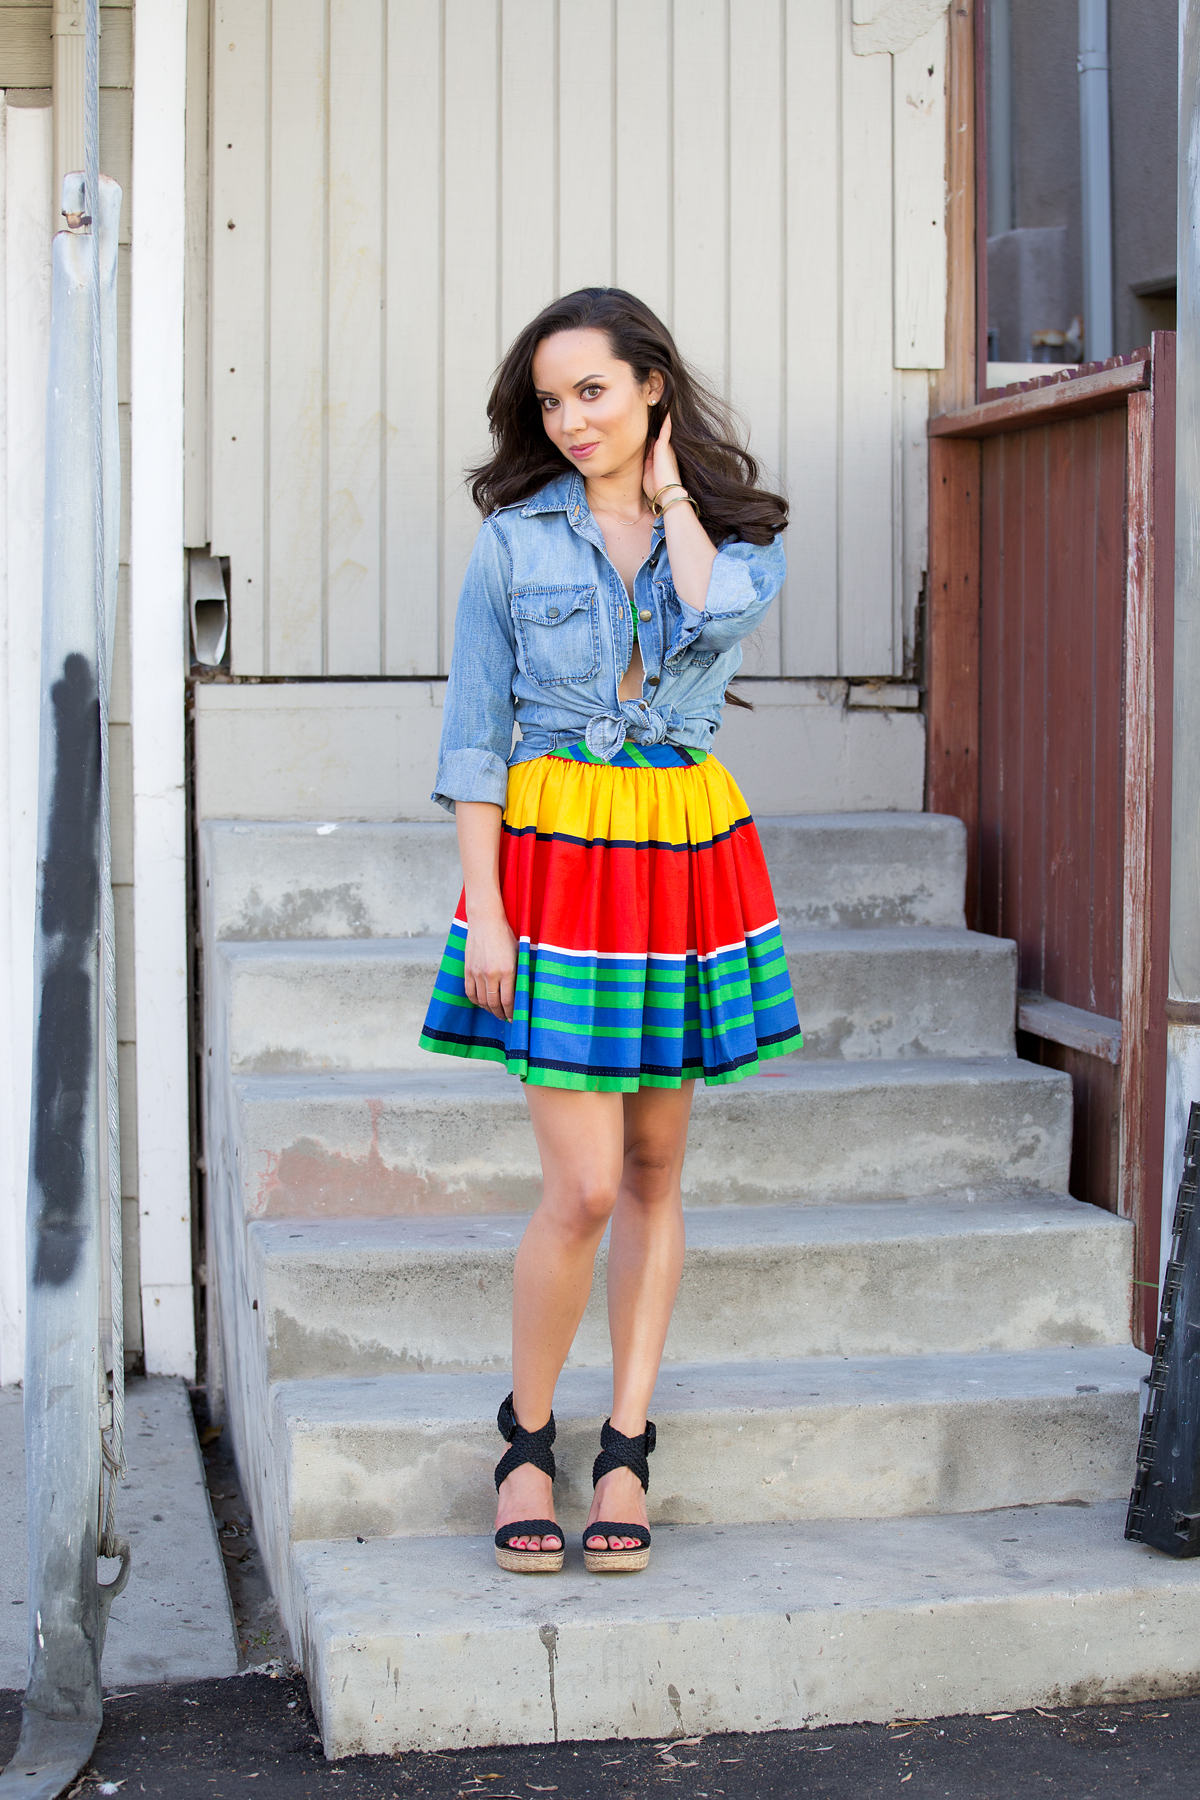 los angeles fashion, striped skirt, fashion blog, style blog, la model, current elliott shirt, denim shirt, two piece, crop top, stuart weitzman wedges, shareen vintage, vintage clothing